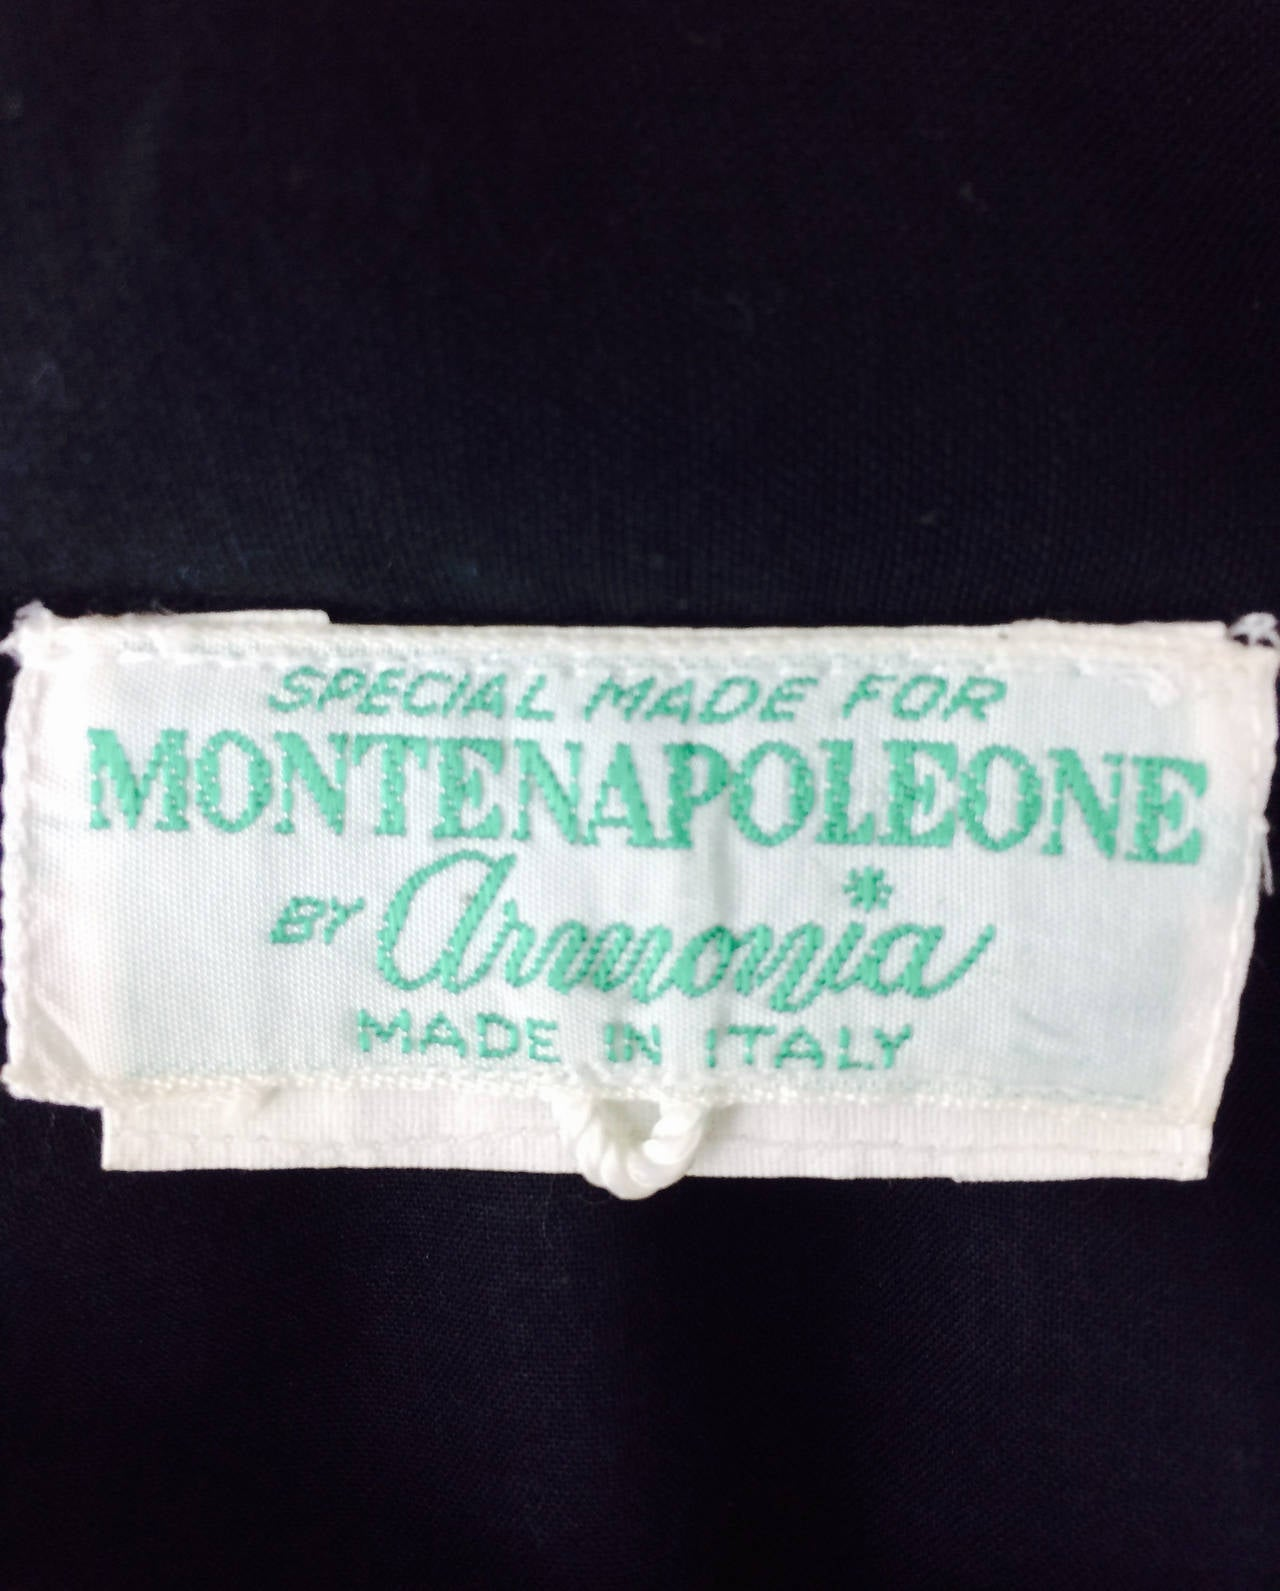 1980s Montenapoleone by Armonia Italy fine cotton shift dress 10